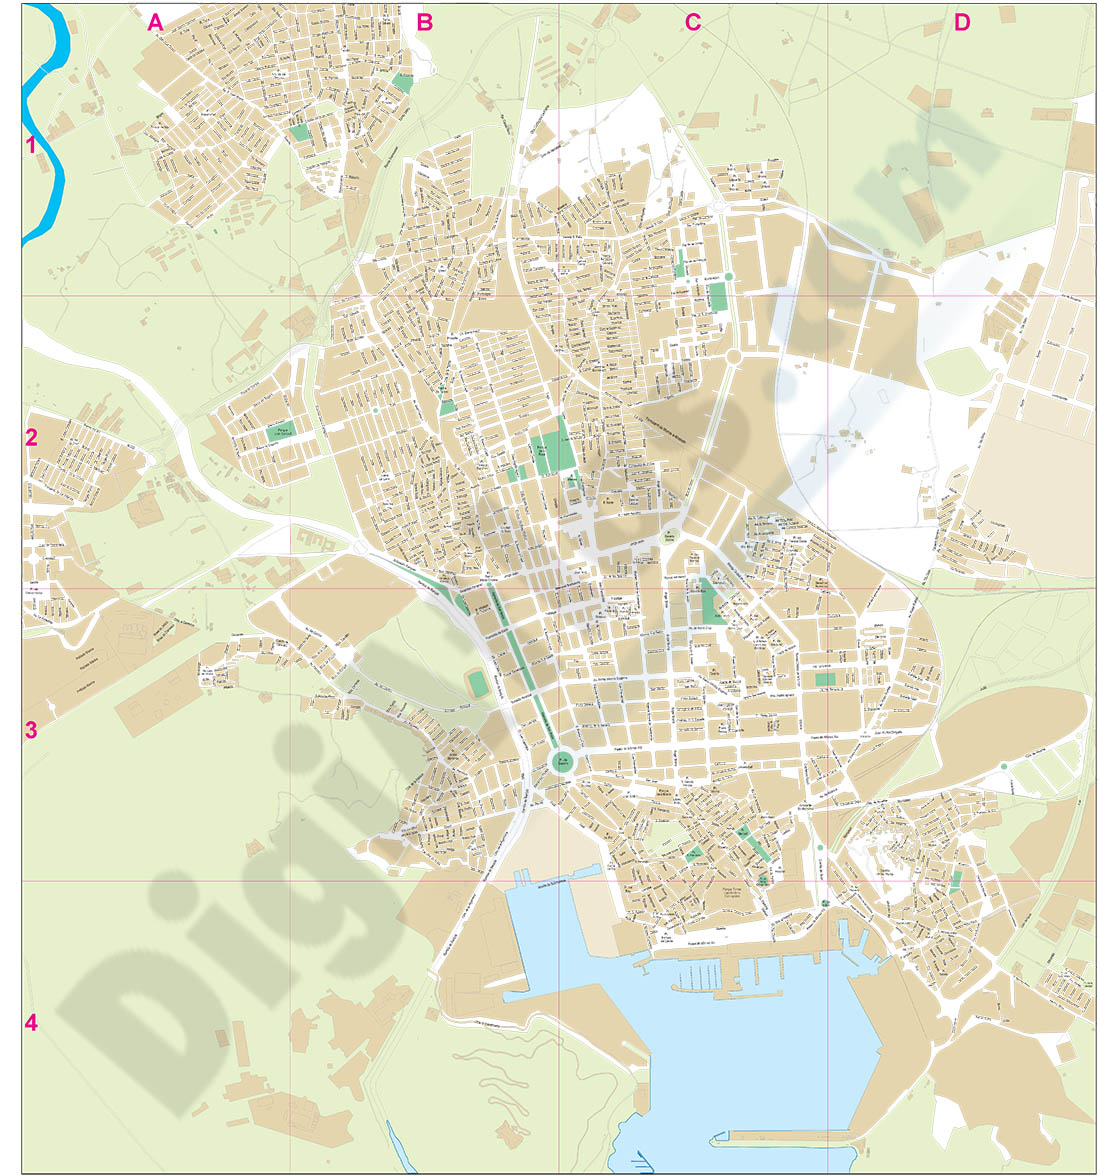 Cartagena (Murcia) - city map